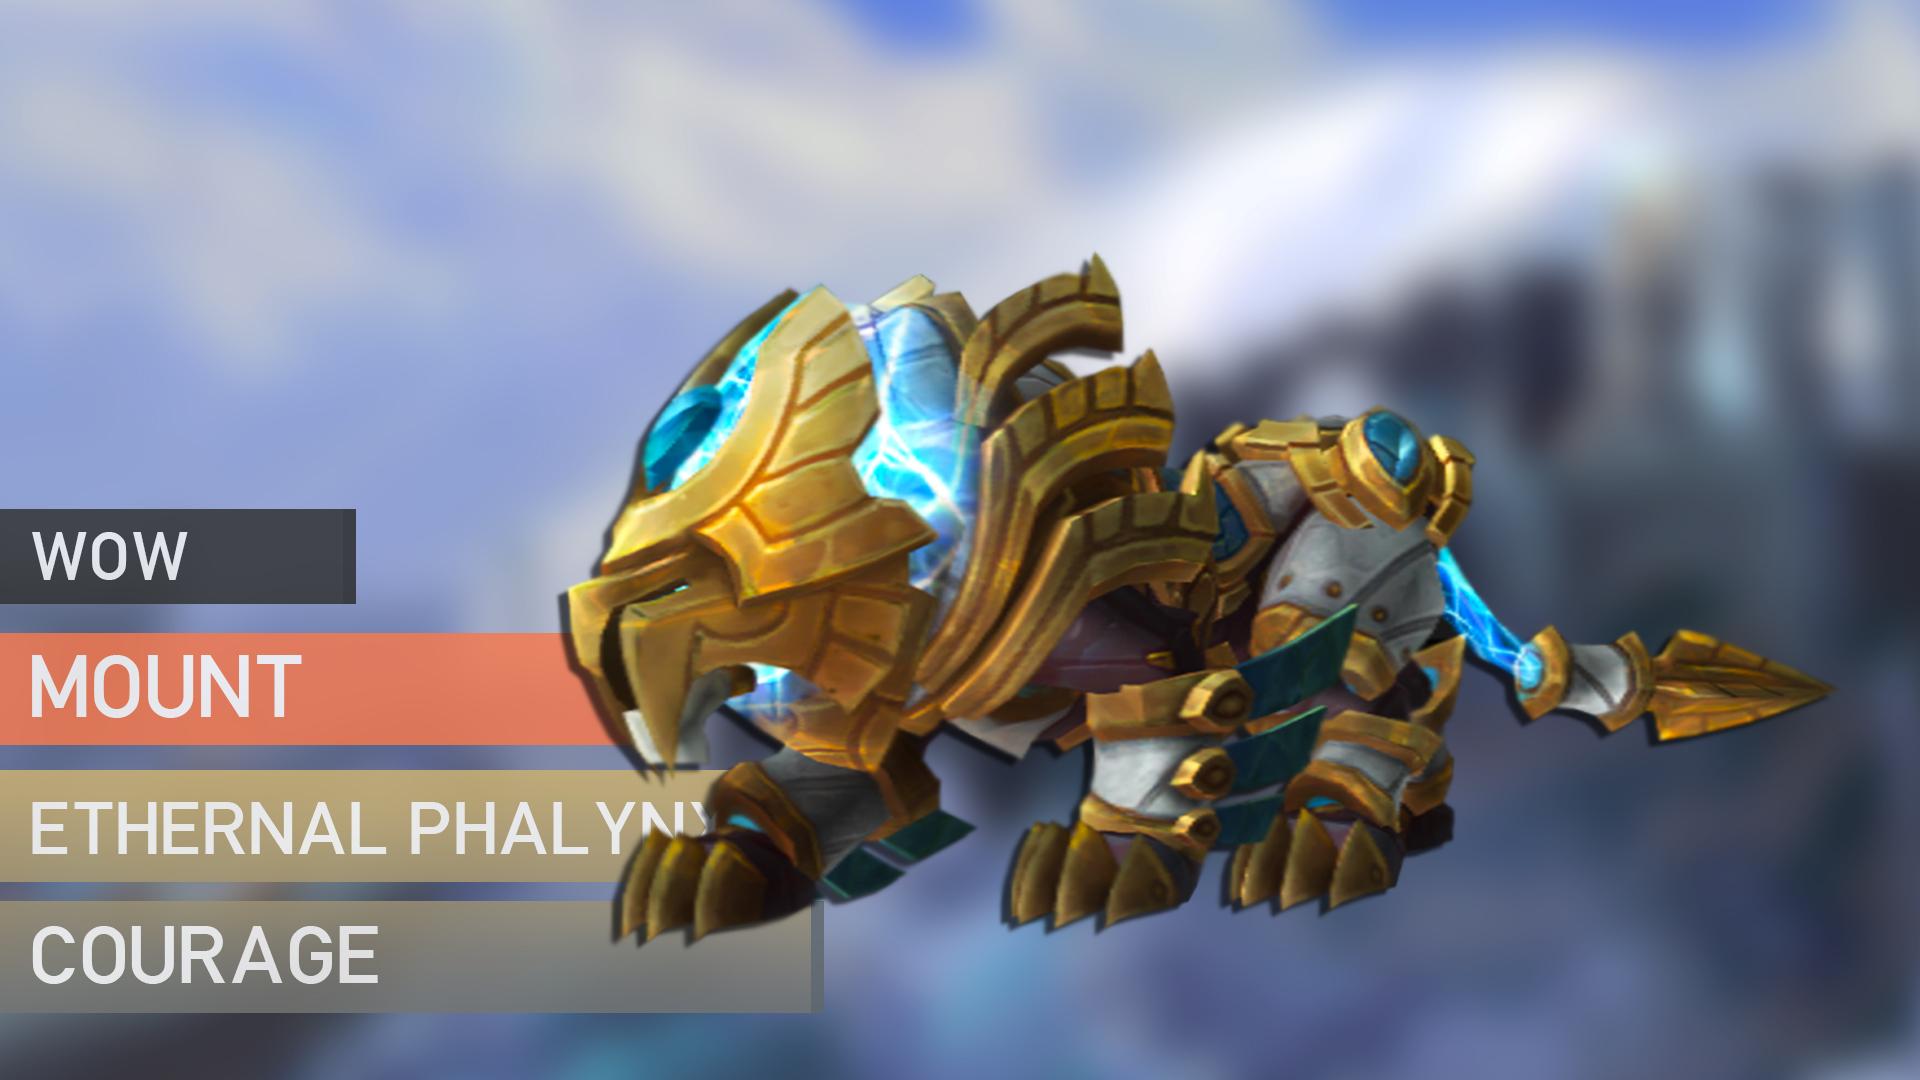 Eternal Phalynx of Courage Mount GBD - e2p.com